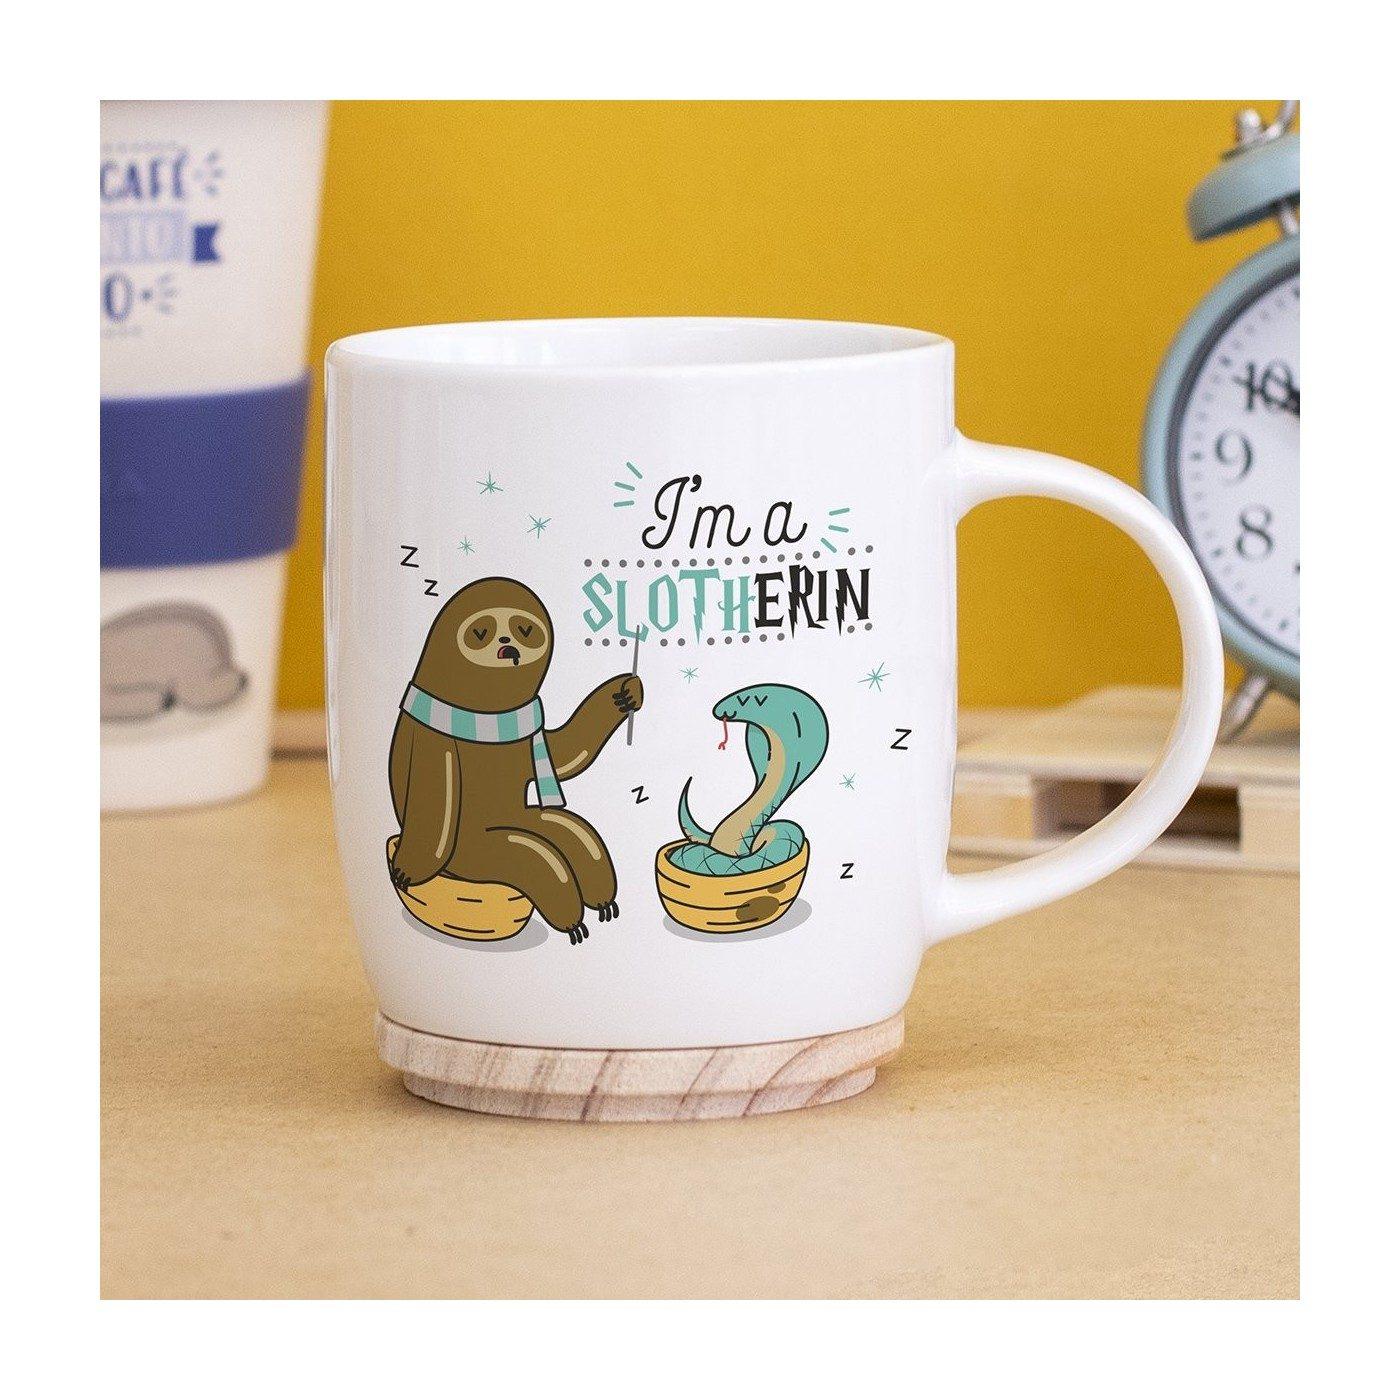 I'm slotherin